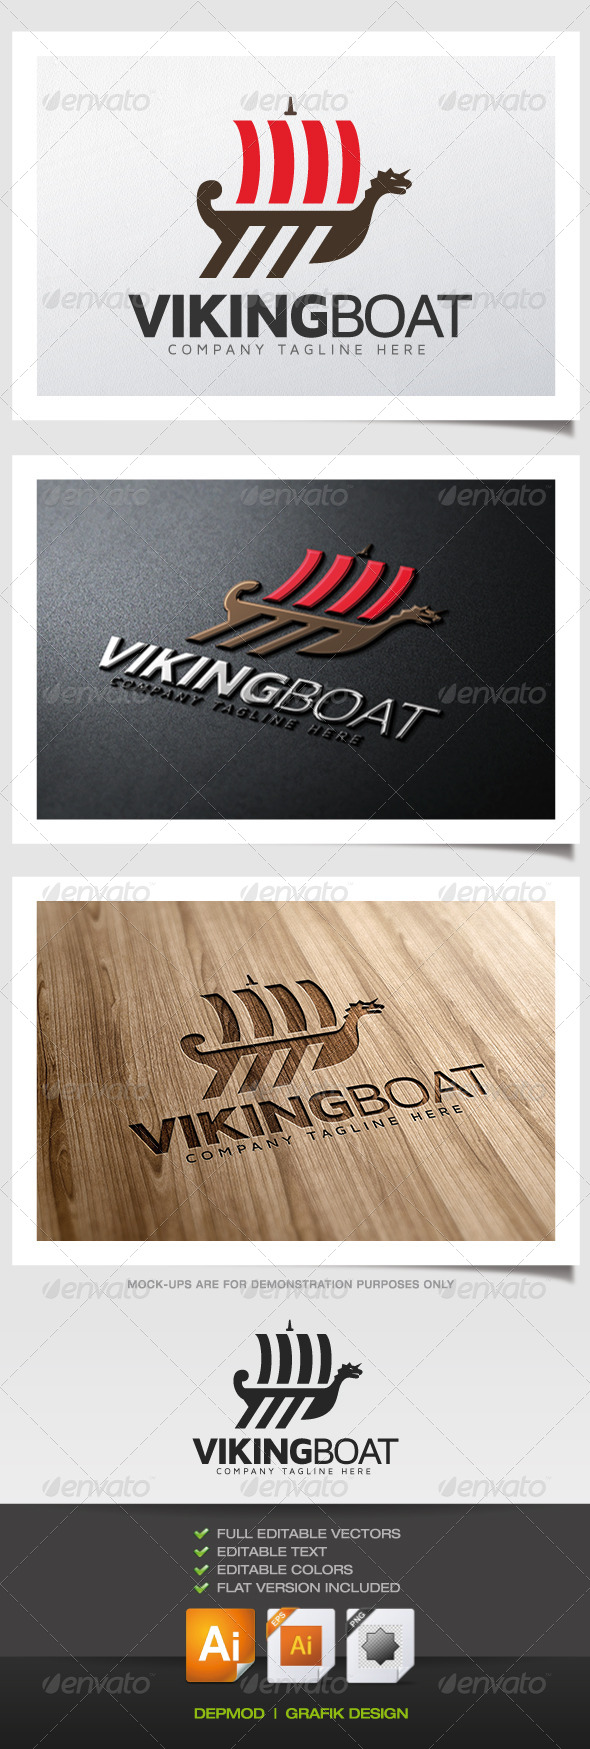 GraphicRiver Viking Boat Logo 5467543